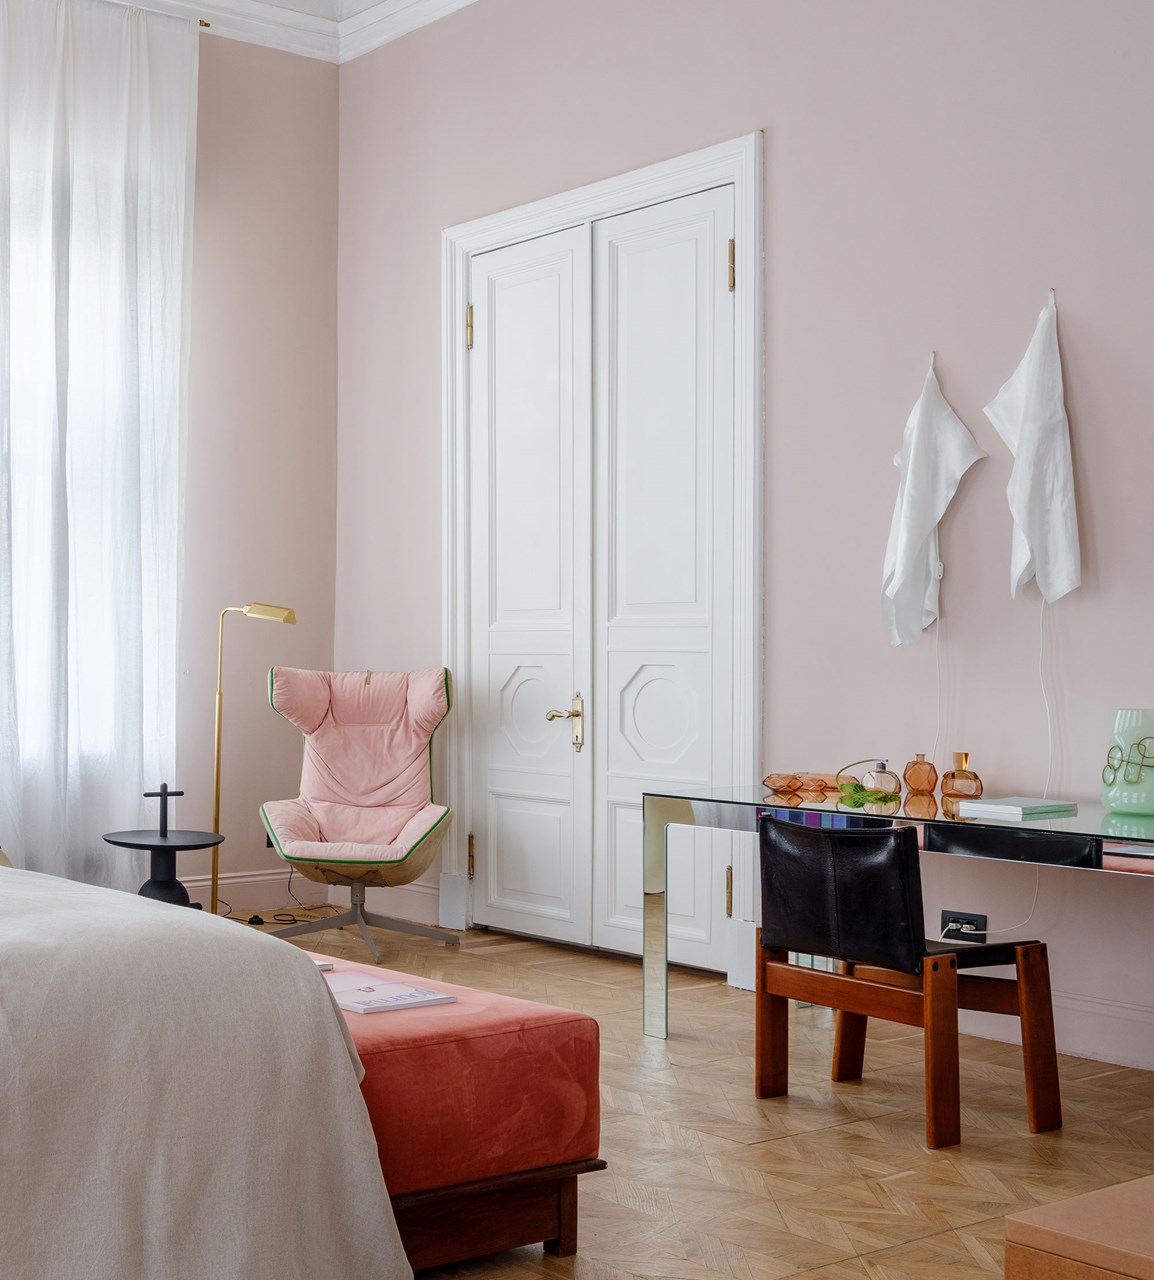 Design Hotels Boutique Luxury Design Hotel Collection